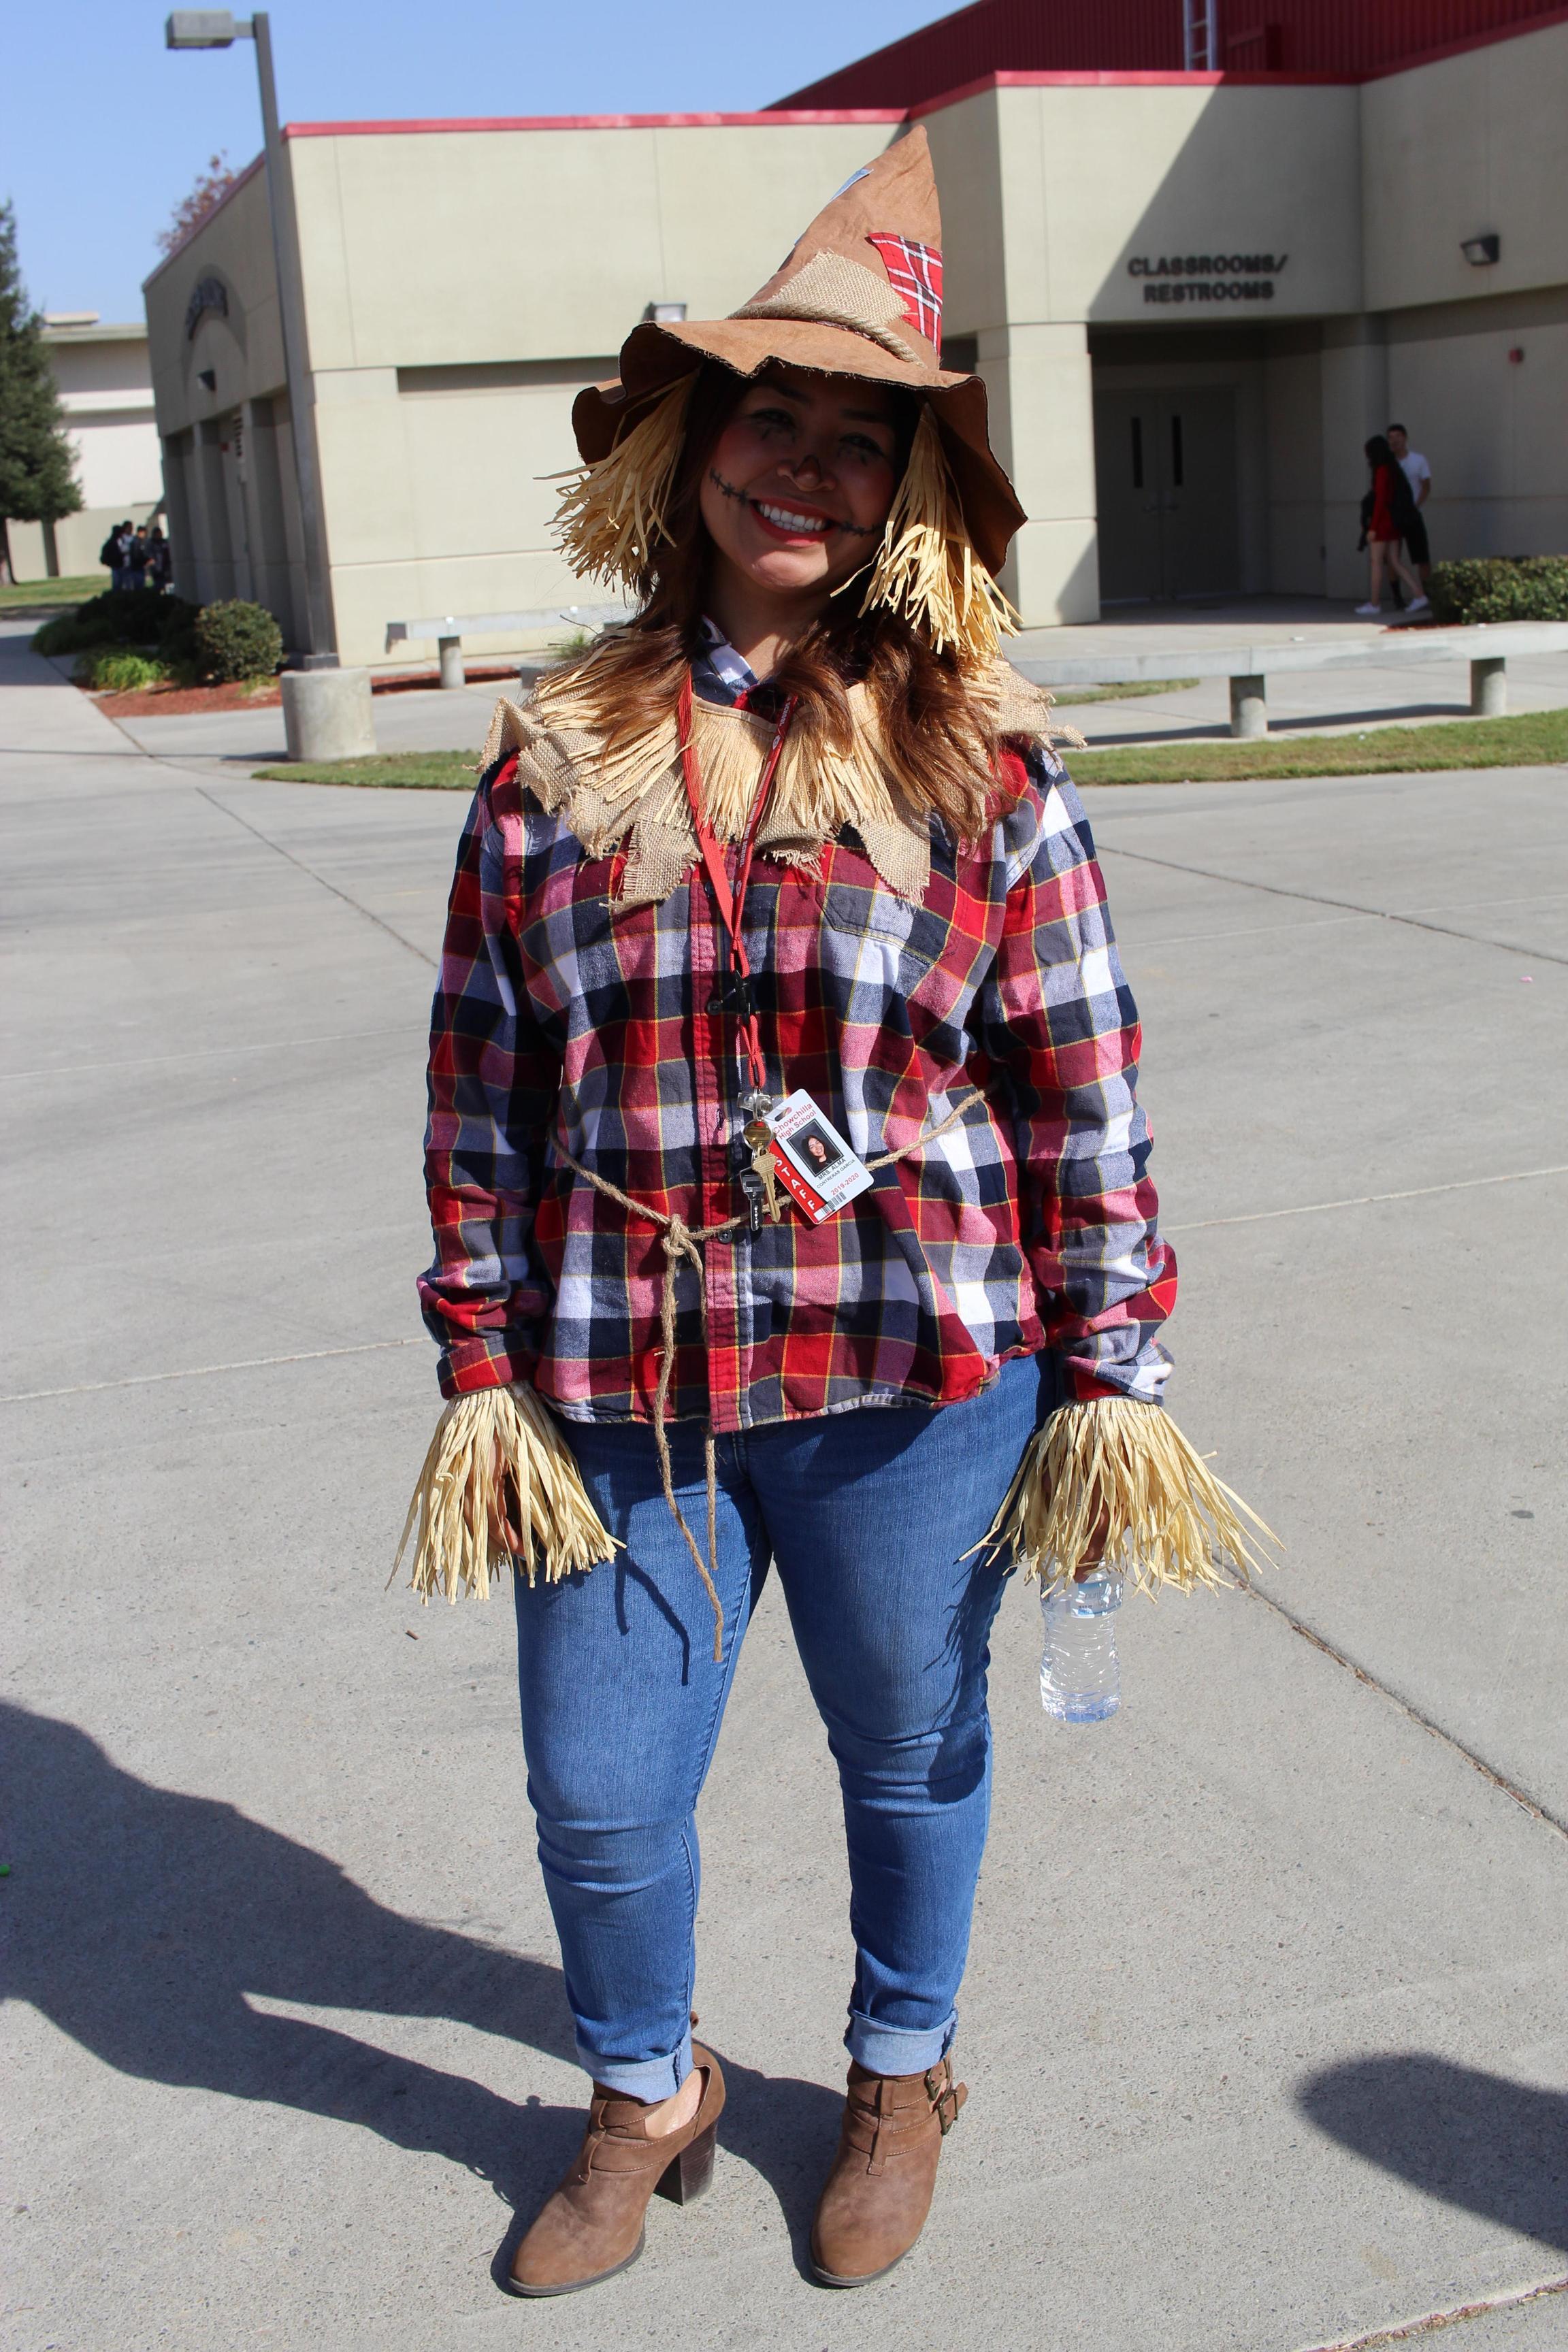 Ms. Contreras